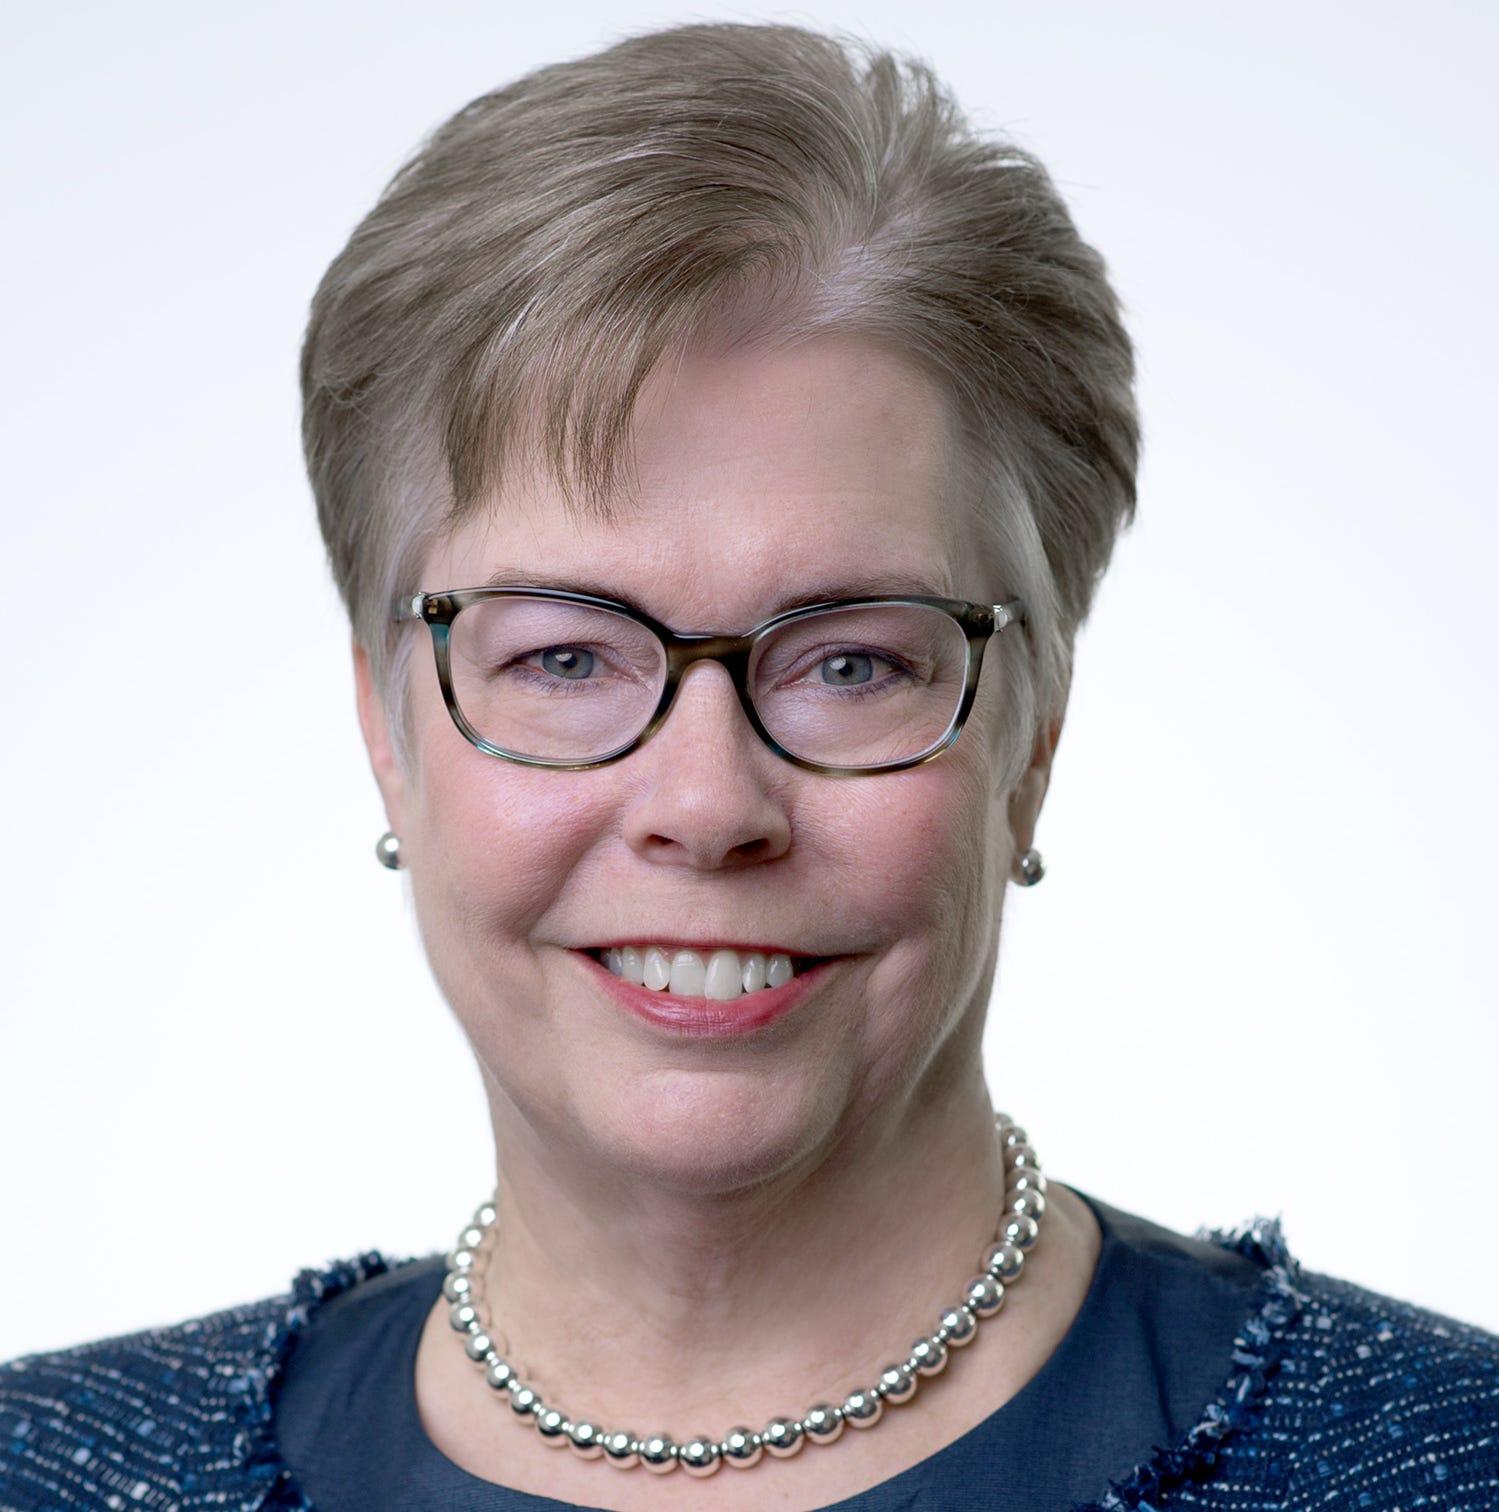 Gov. Bill Haslam appoints Patricia Head Moskal as new Nashville judge